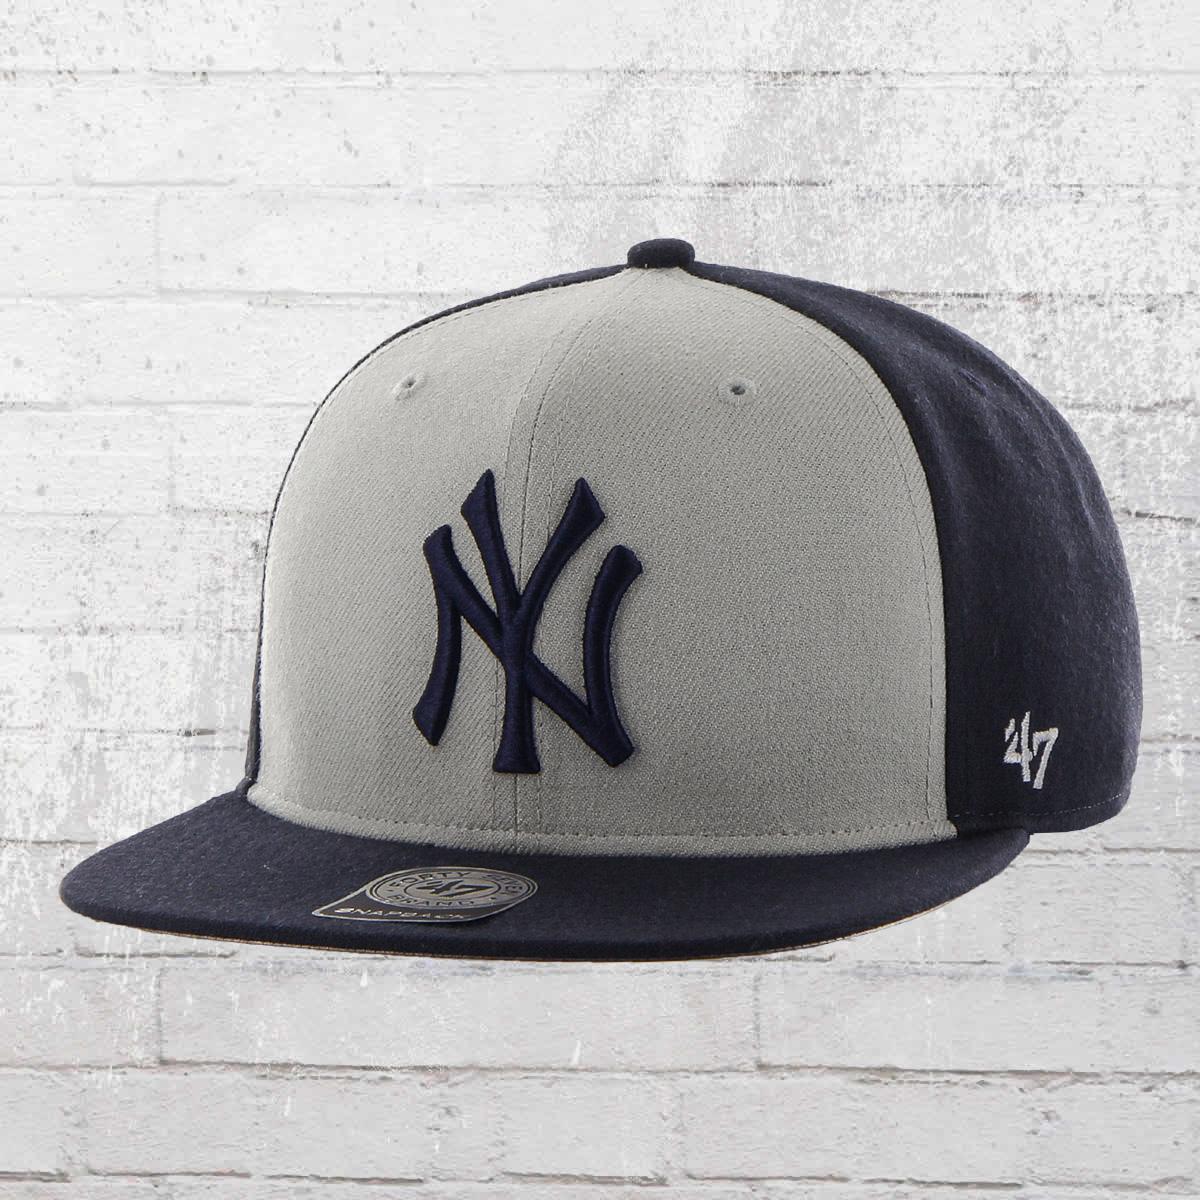 275b8210b33 47 Brand MLB Snapback Cap New York Yankees Baseball Hat navy grey